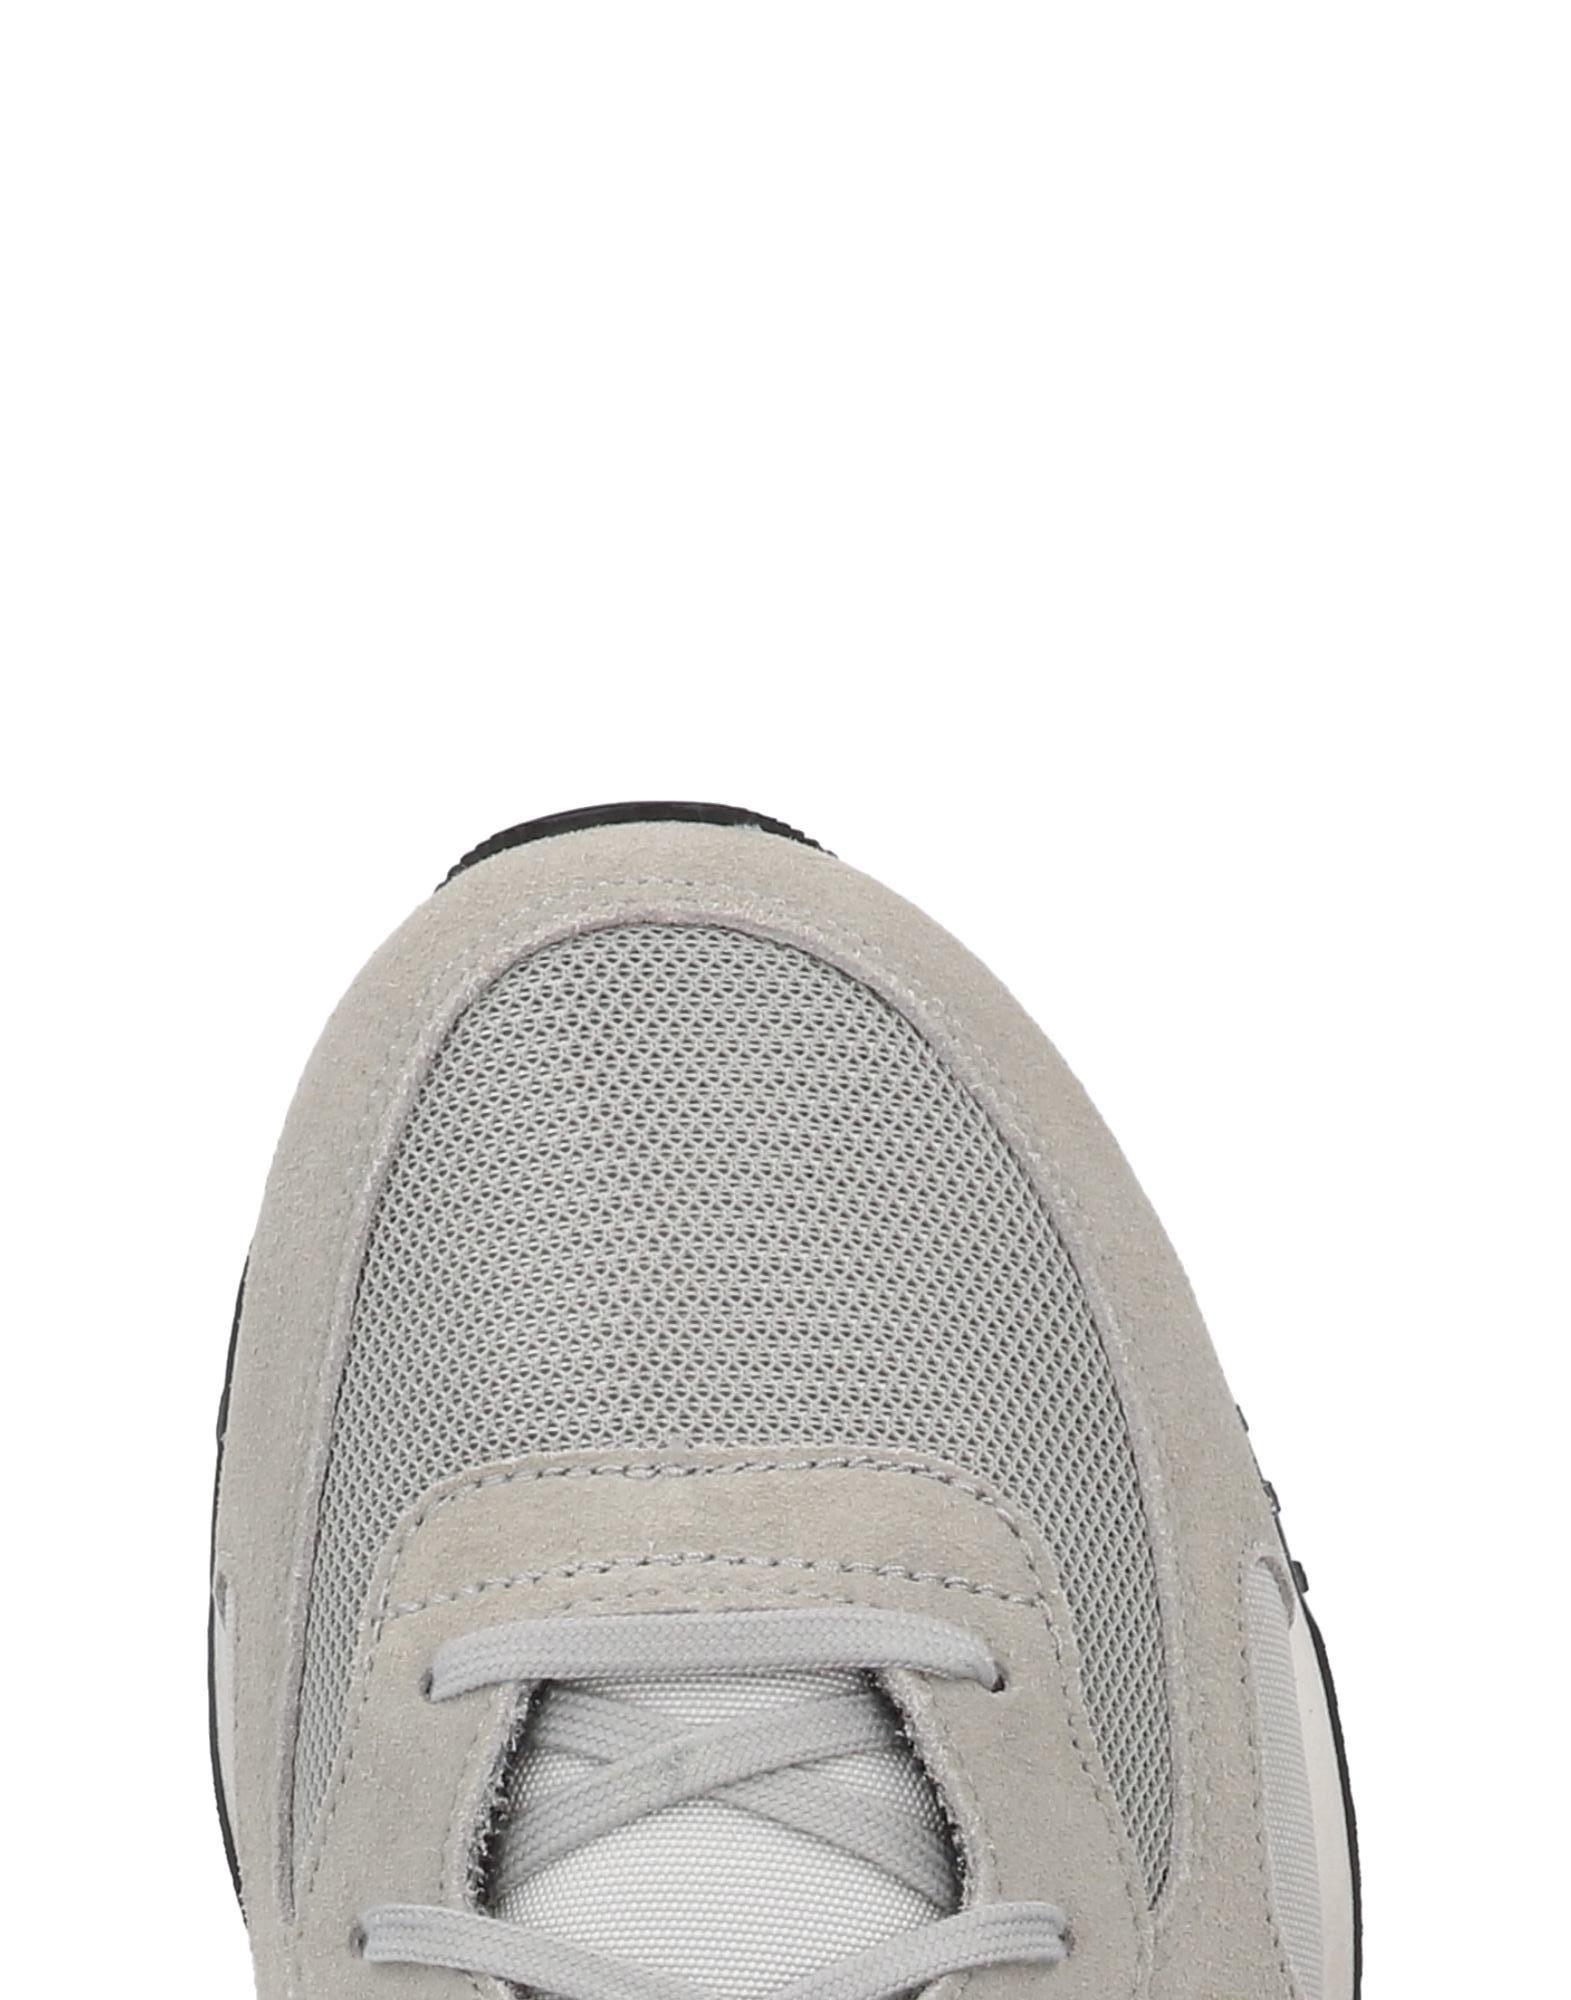 Converse Suede Low-tops & Sneakers in Grey (Grey)